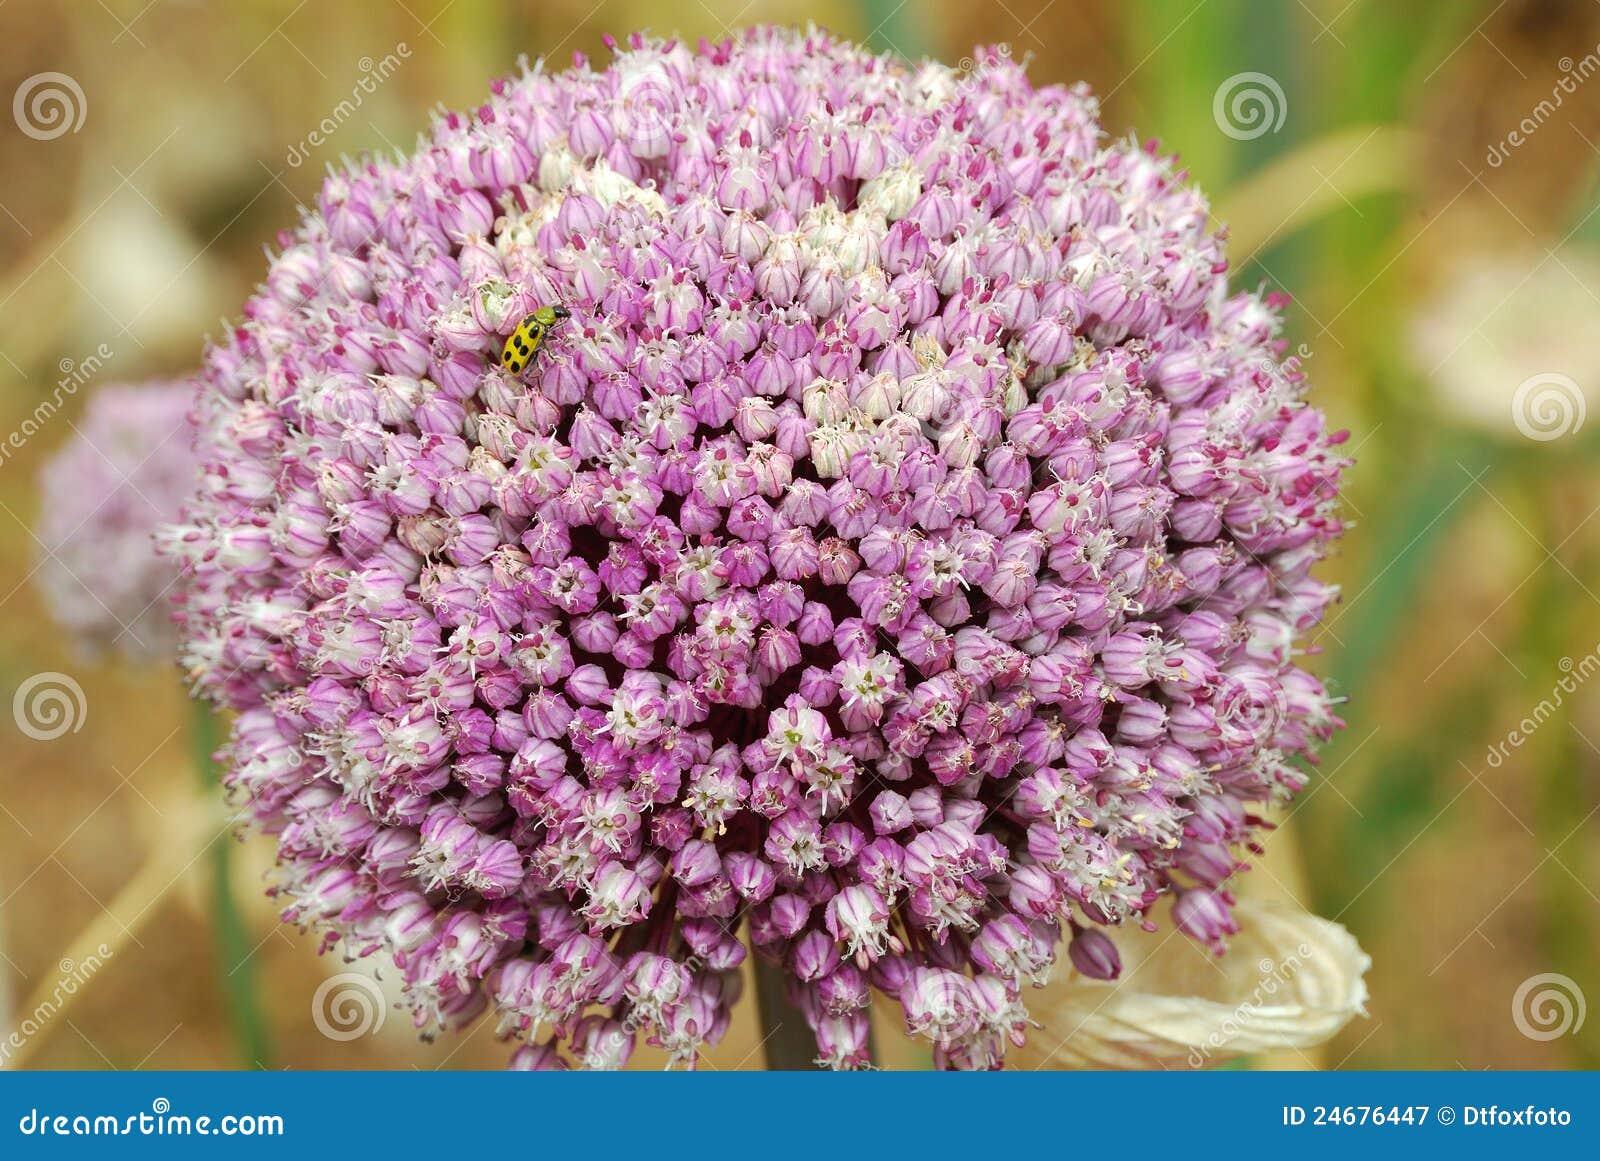 Garlic Flower Royalty Free Stock graphy Image